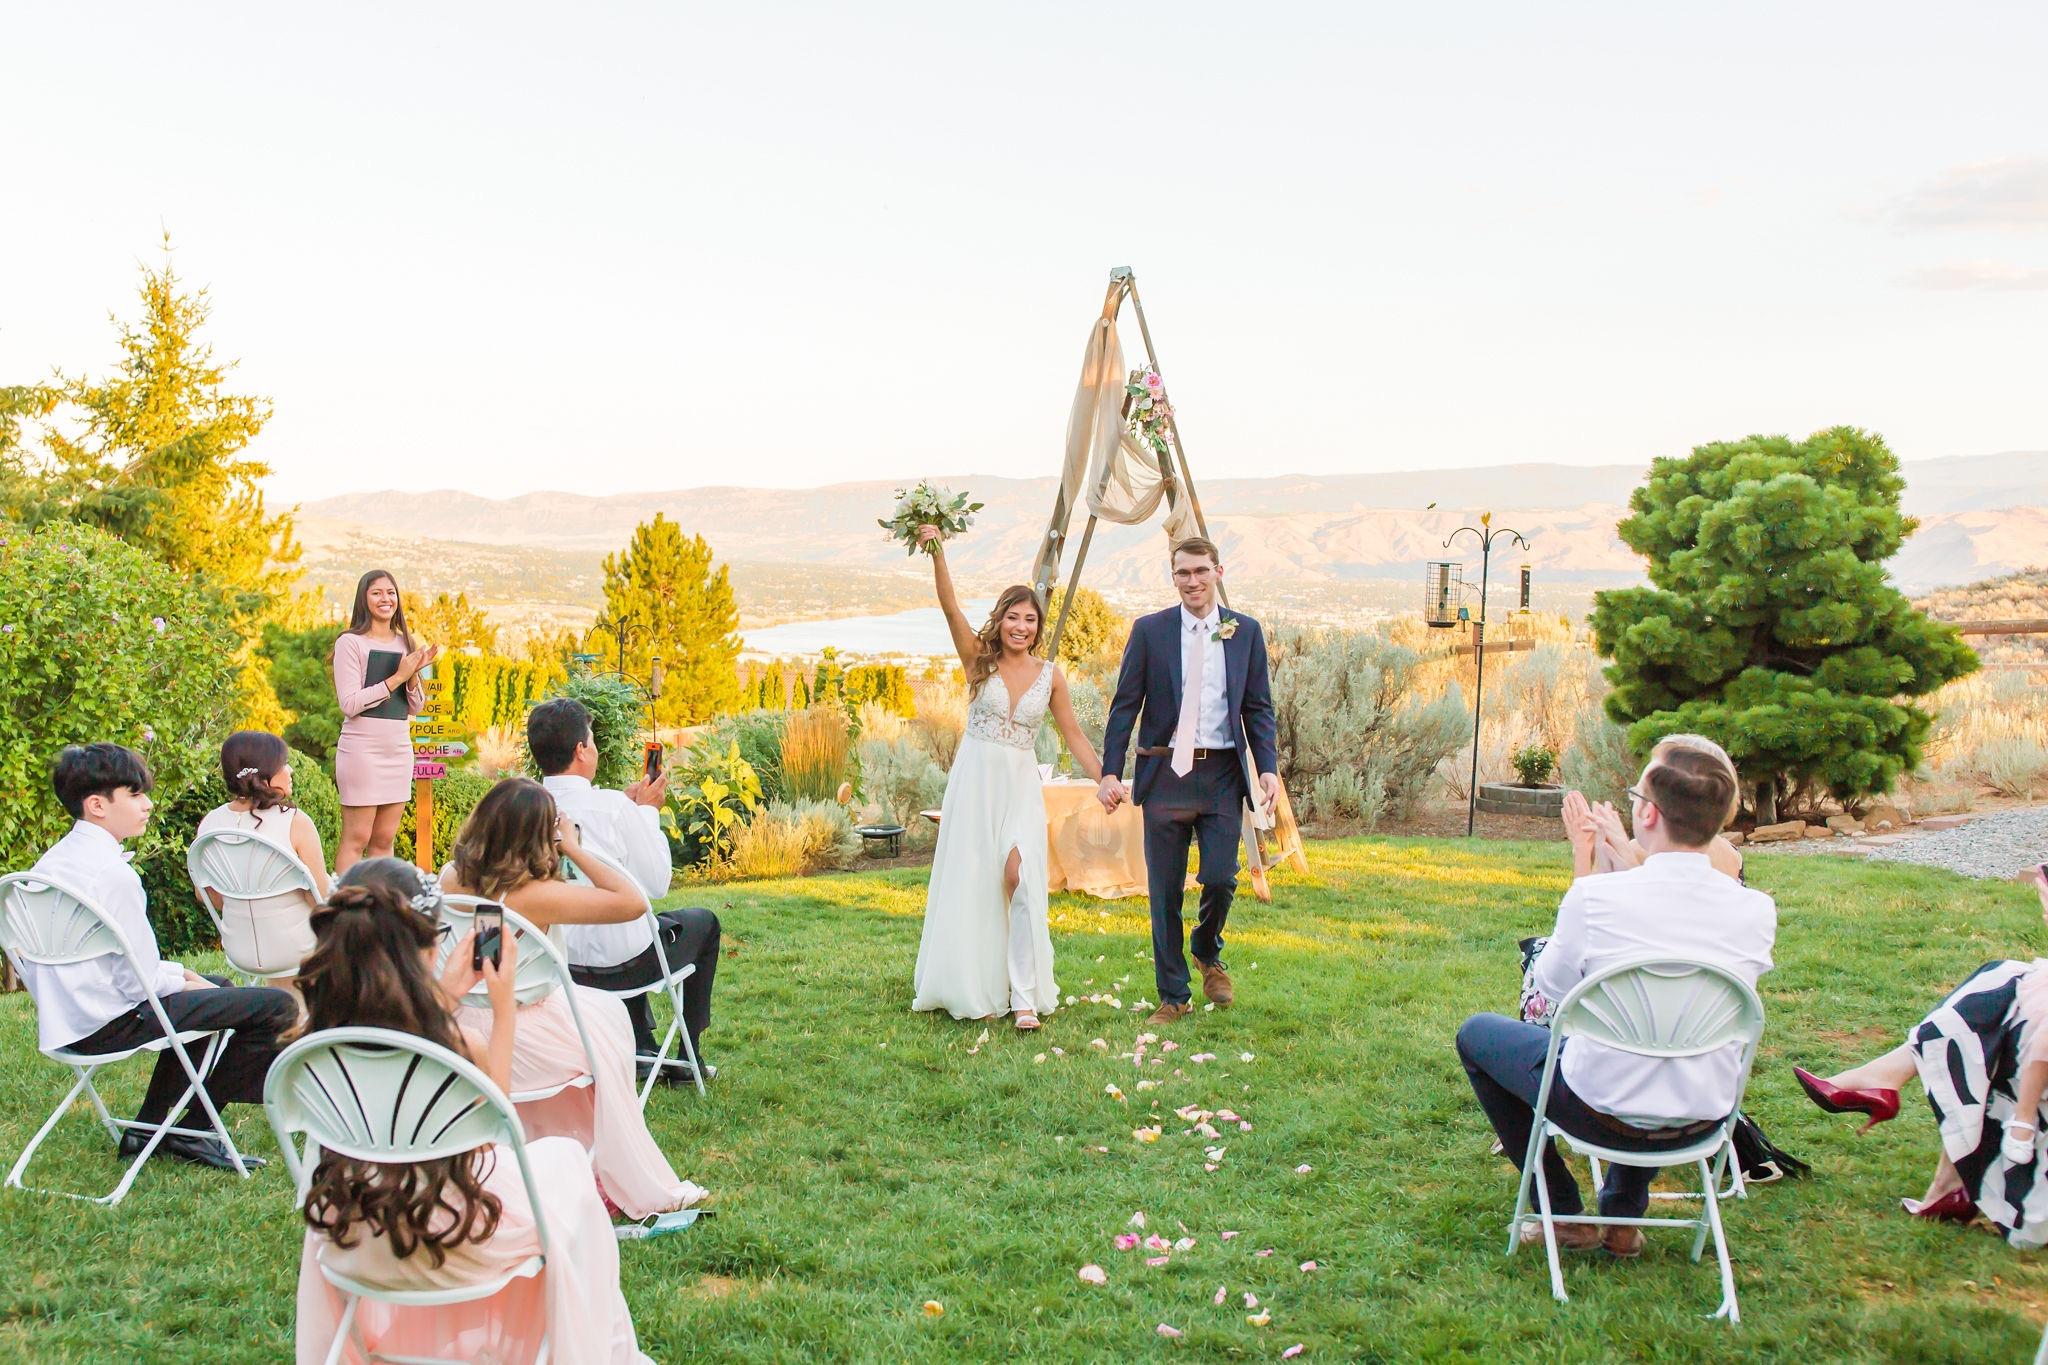 Jessica and Doug as newly pronounced husband and wife